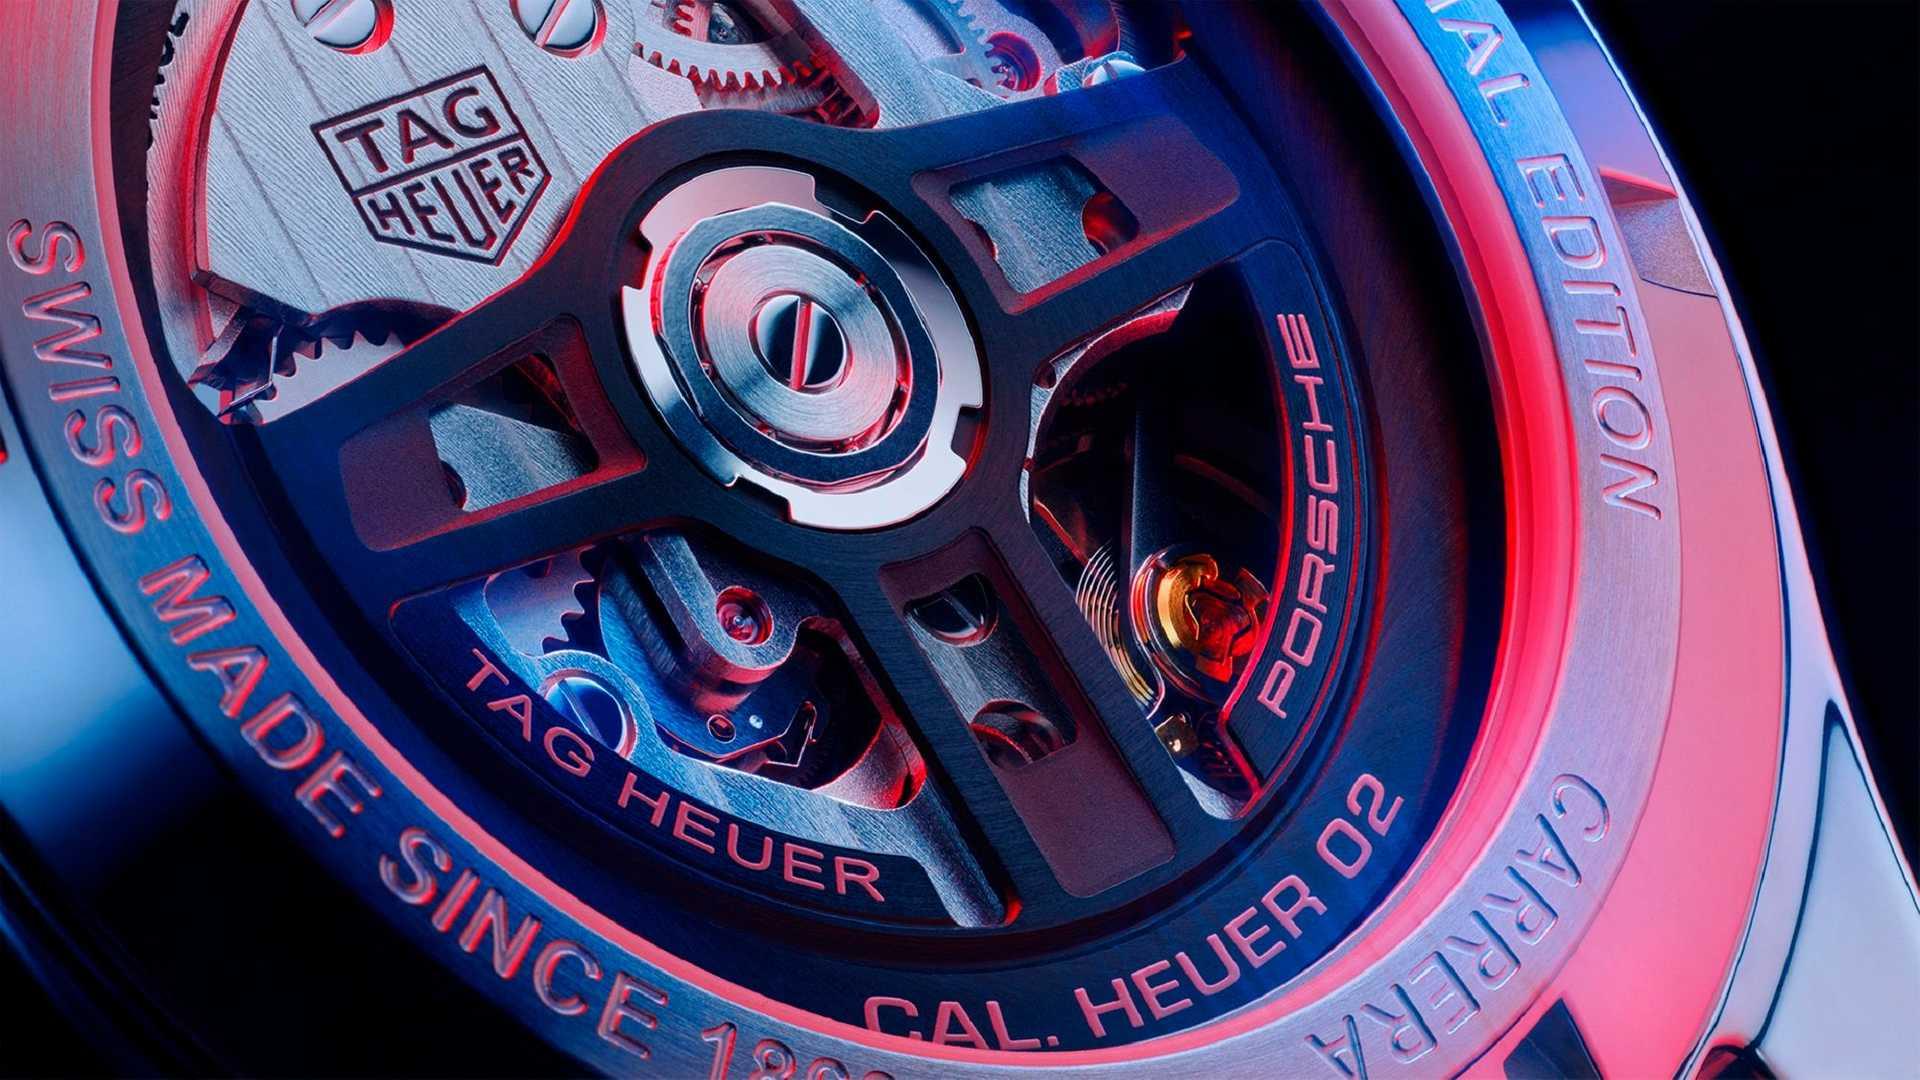 tag-heuer-carrera-porsche-chronograph